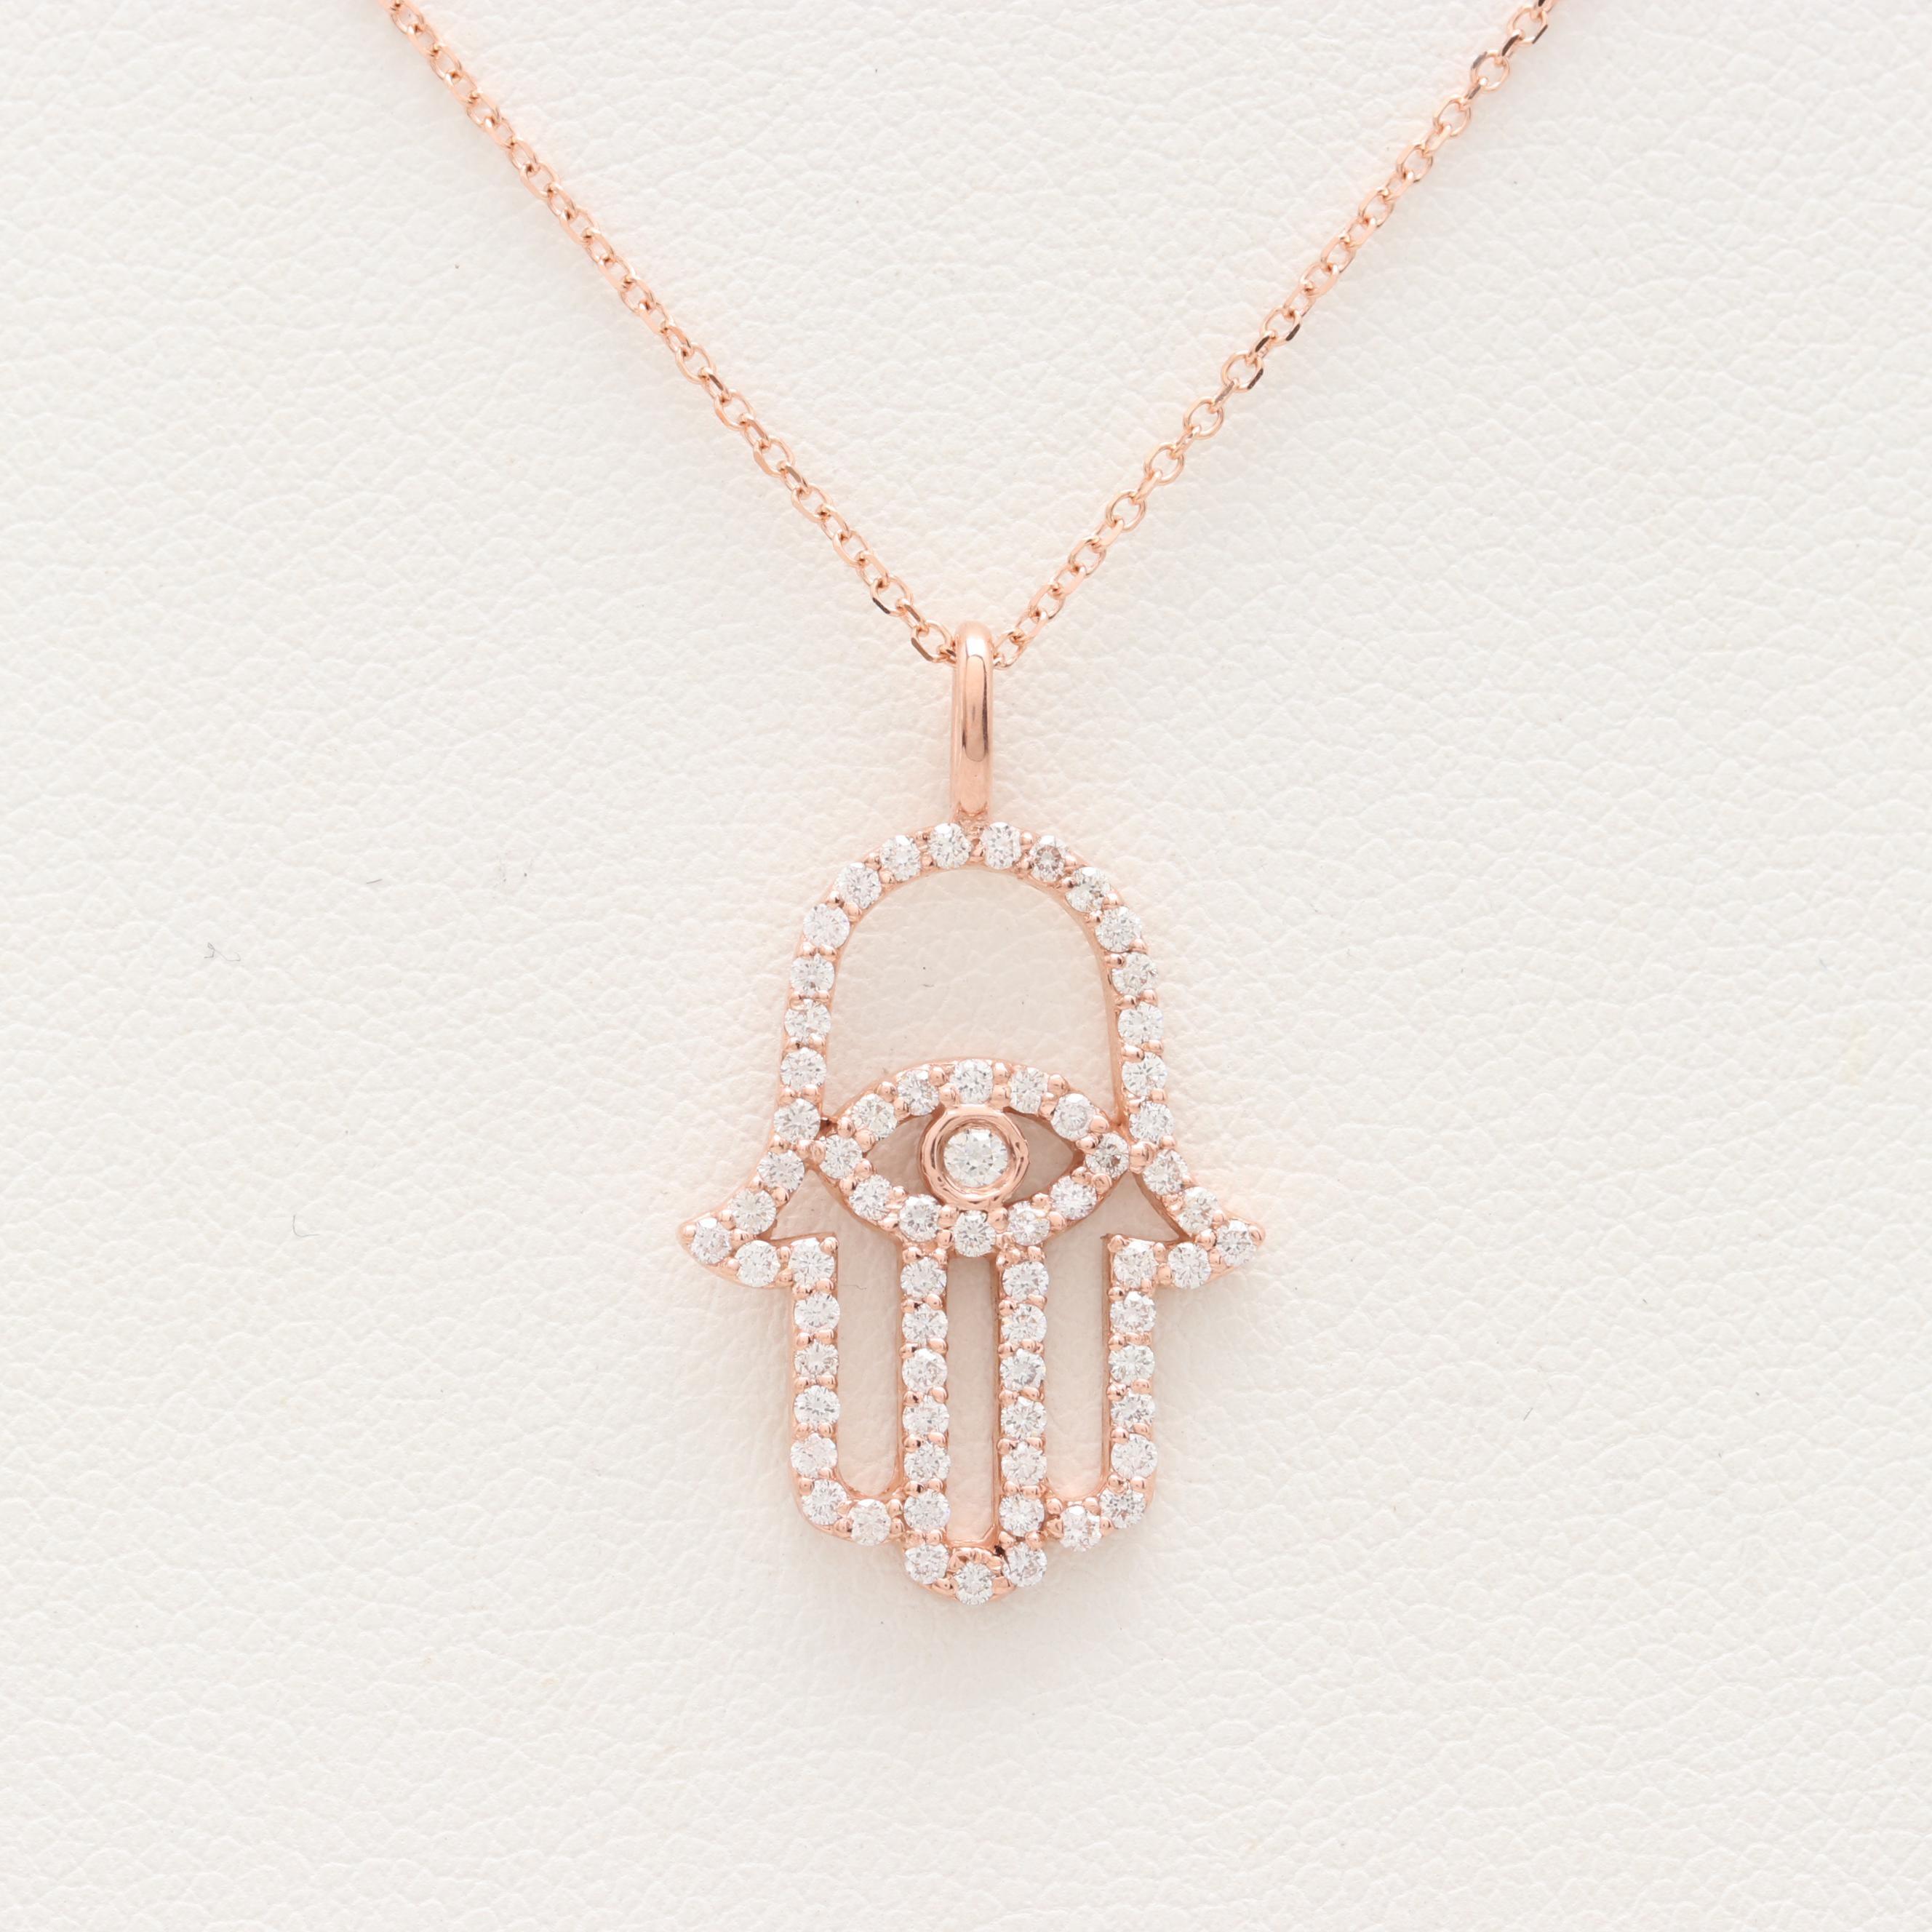 14K Rose Gold Diamond Hamsa Hand Necklace